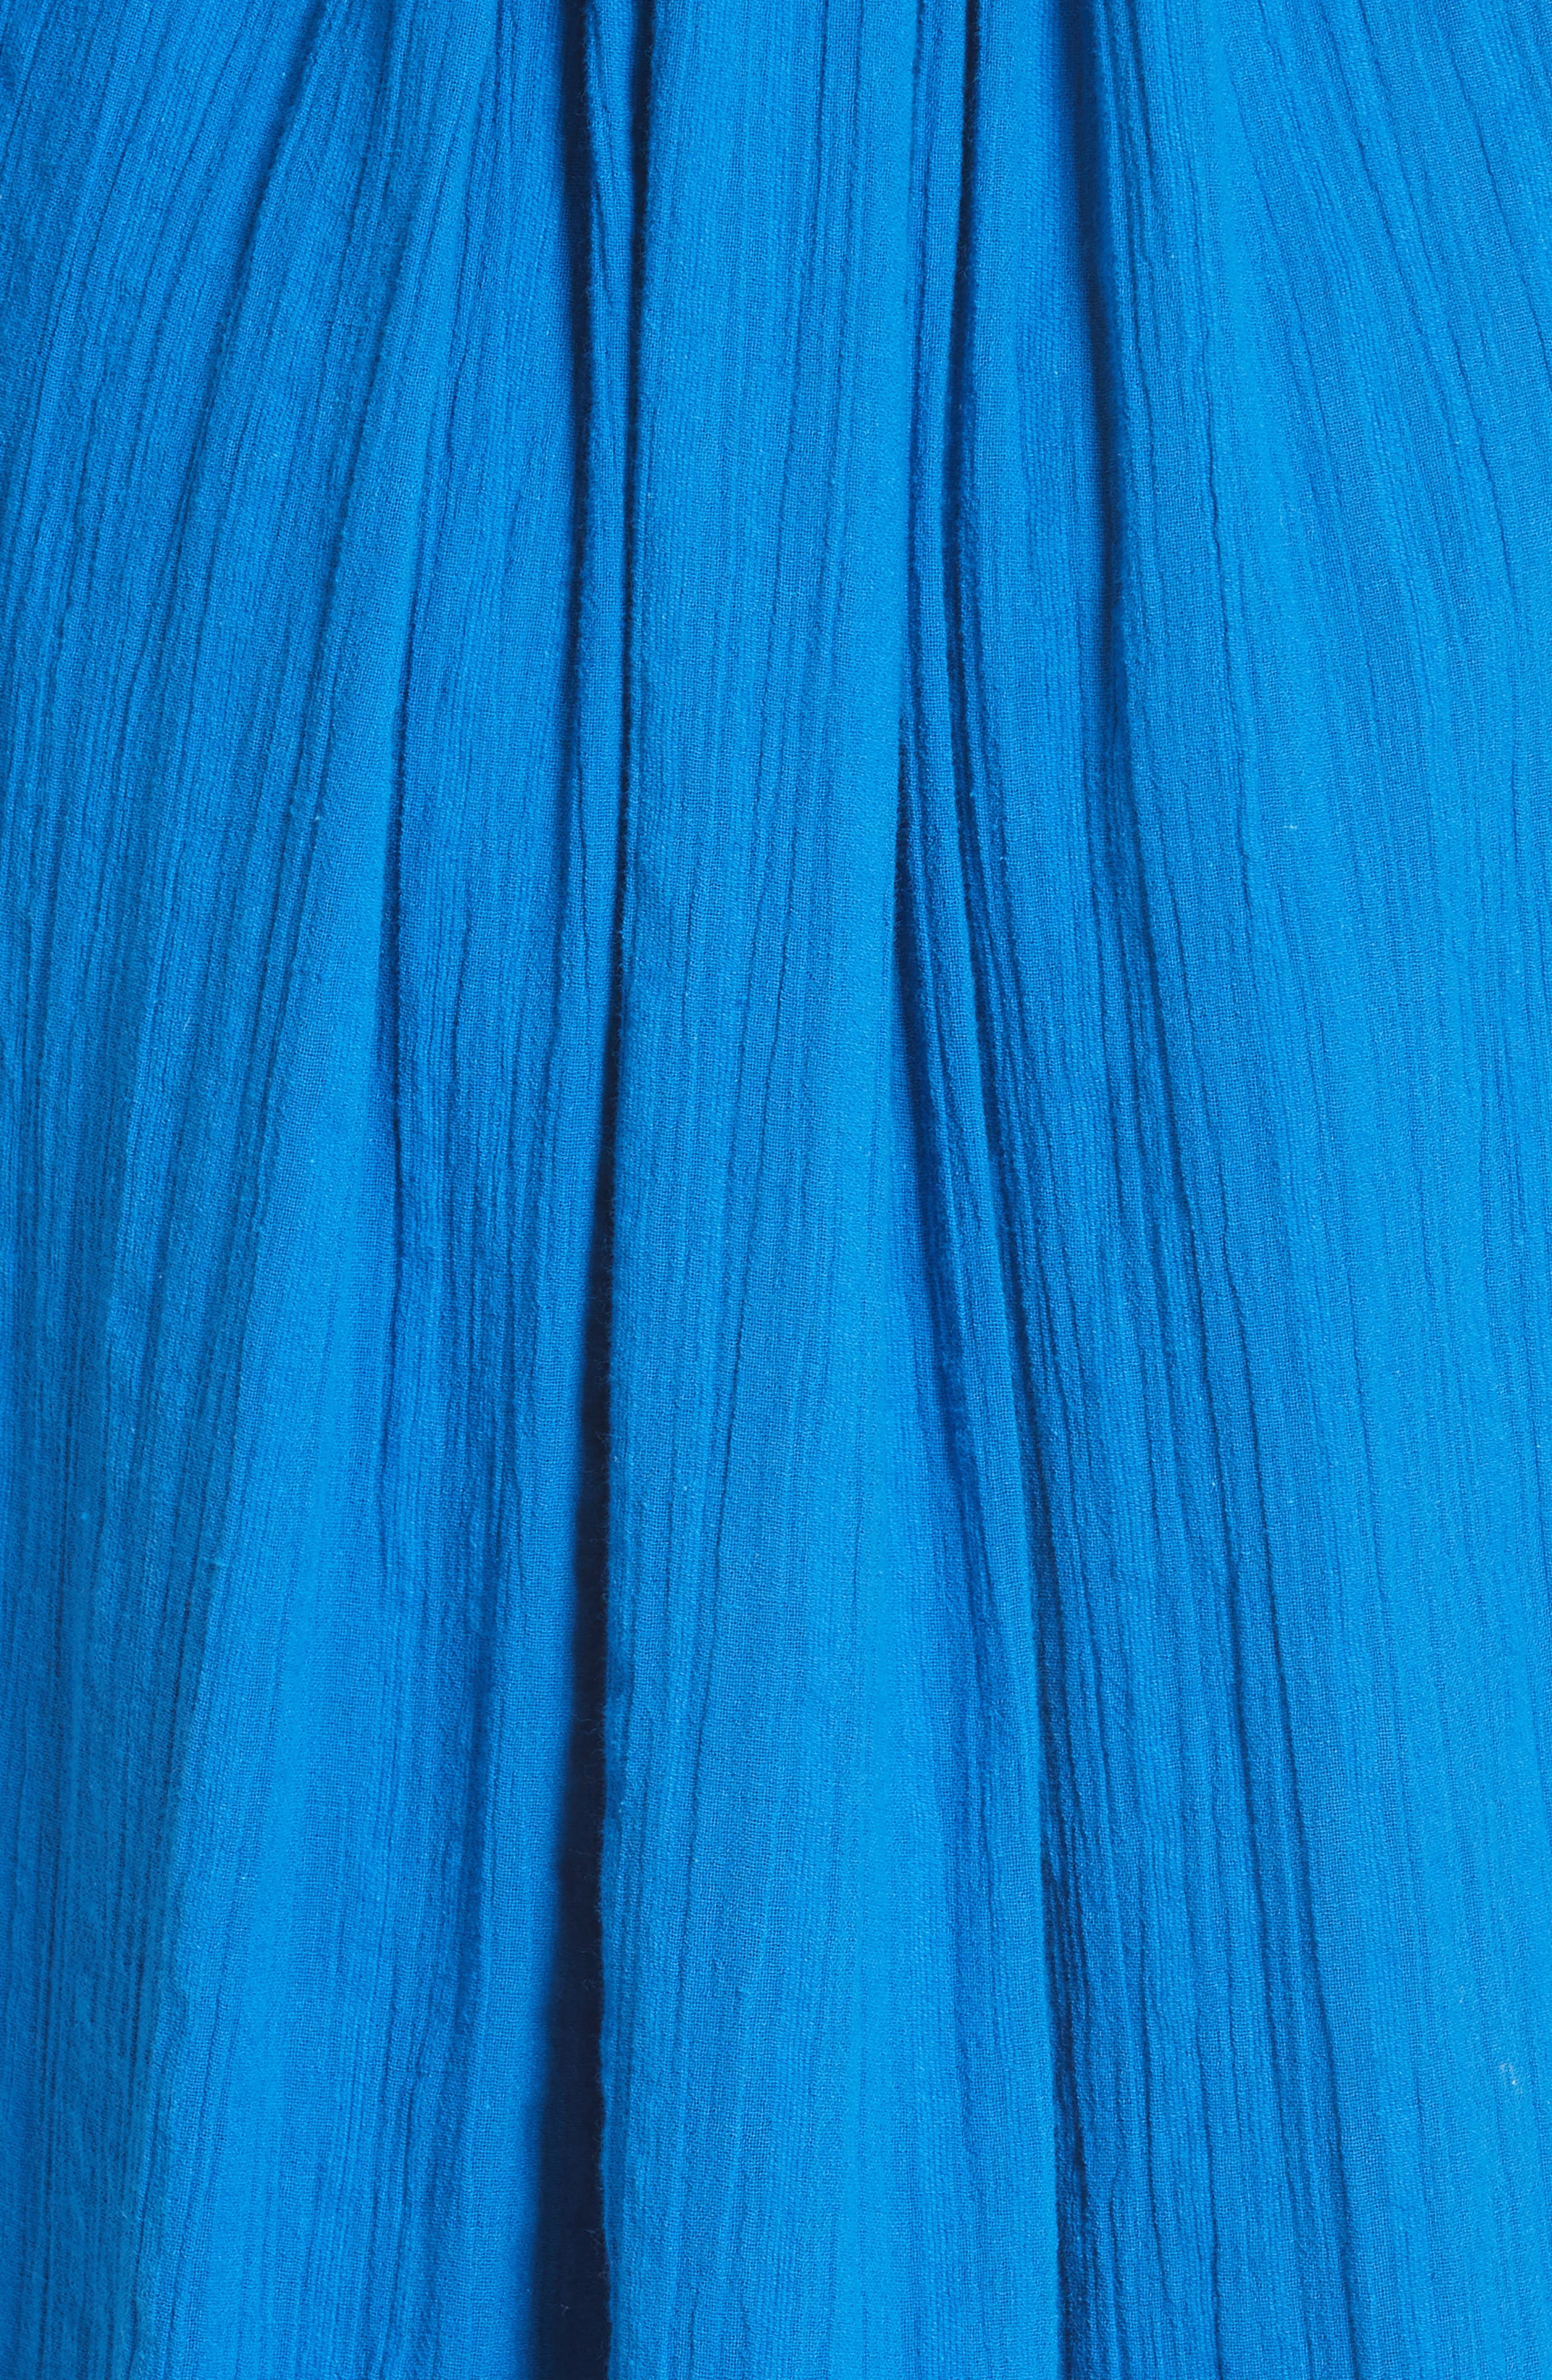 Filia Embroidered Midi Dress,                             Alternate thumbnail 5, color,                             400